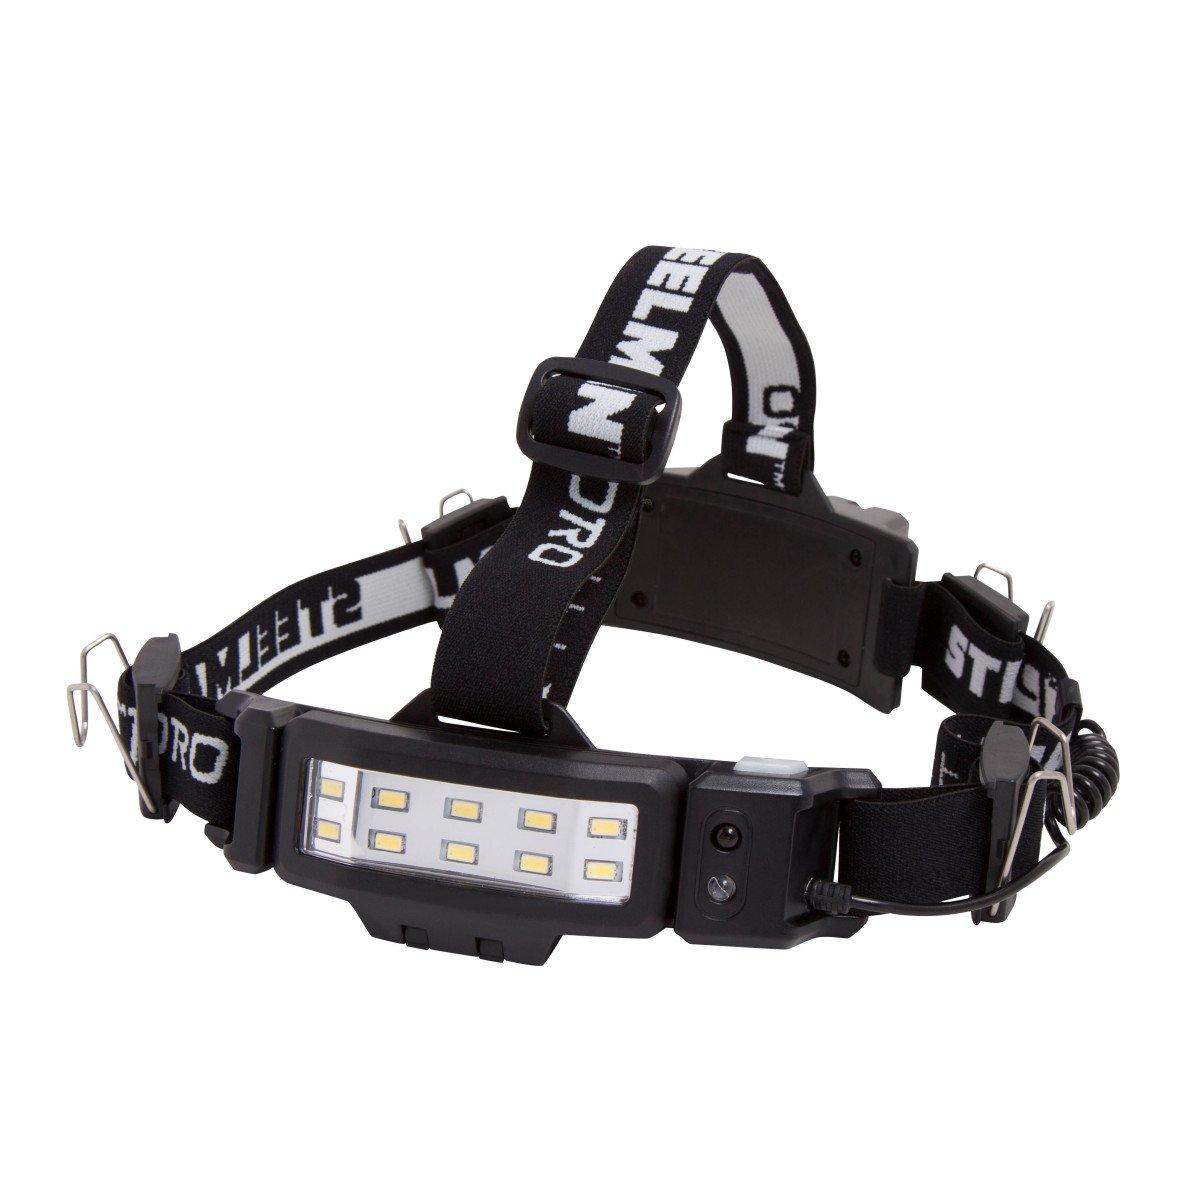 STEELMAN PRO 78834 Slim Profile Rechargeable LED 250-Lumen Motion Activated Headlamp by Steelman Pro